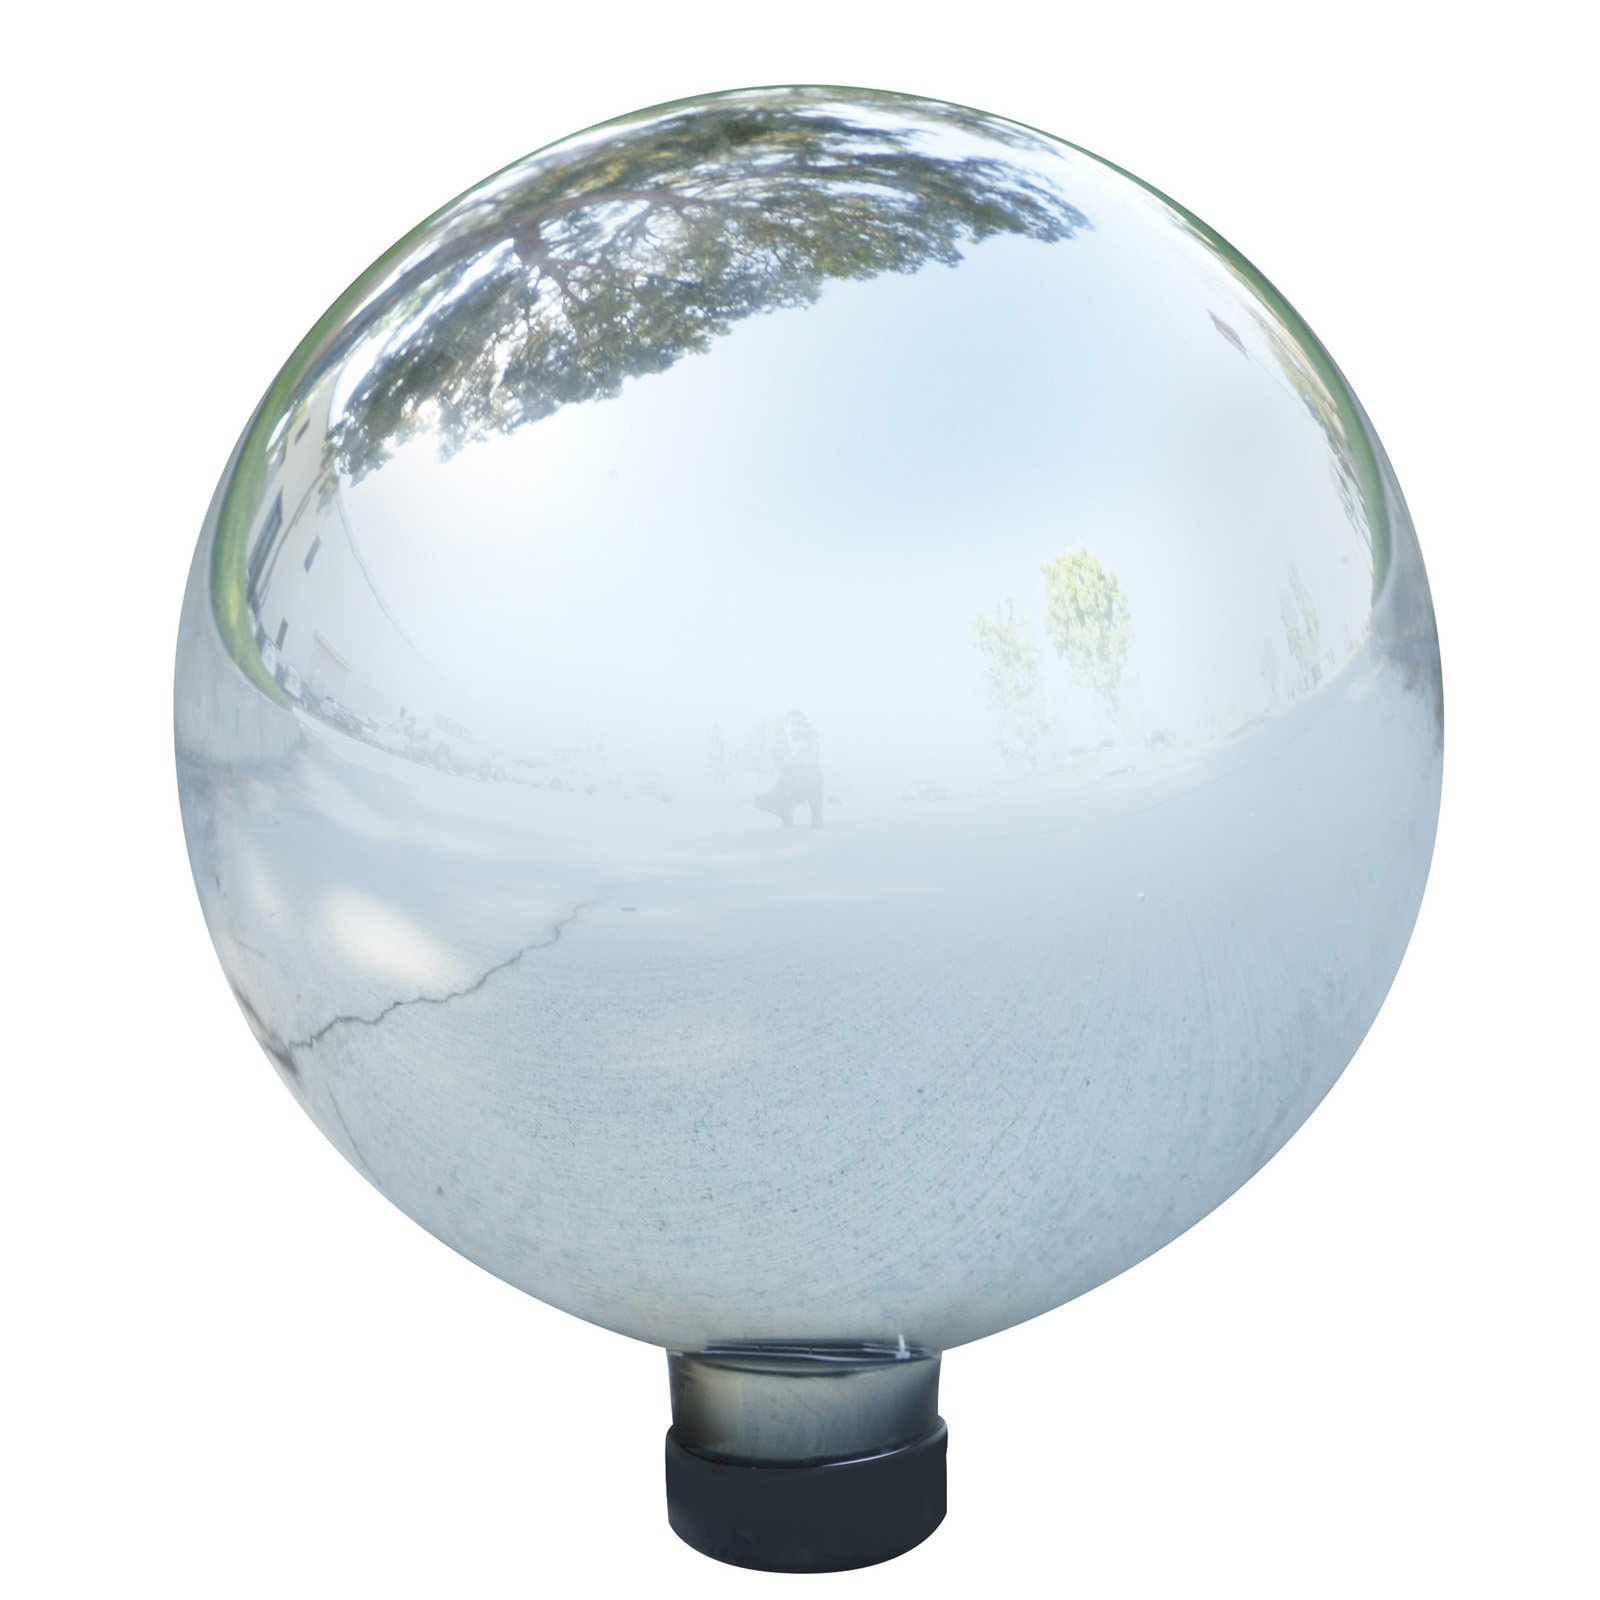 Alpine Reflective Silver Glass Gazing Globe, 11 Inch Tall